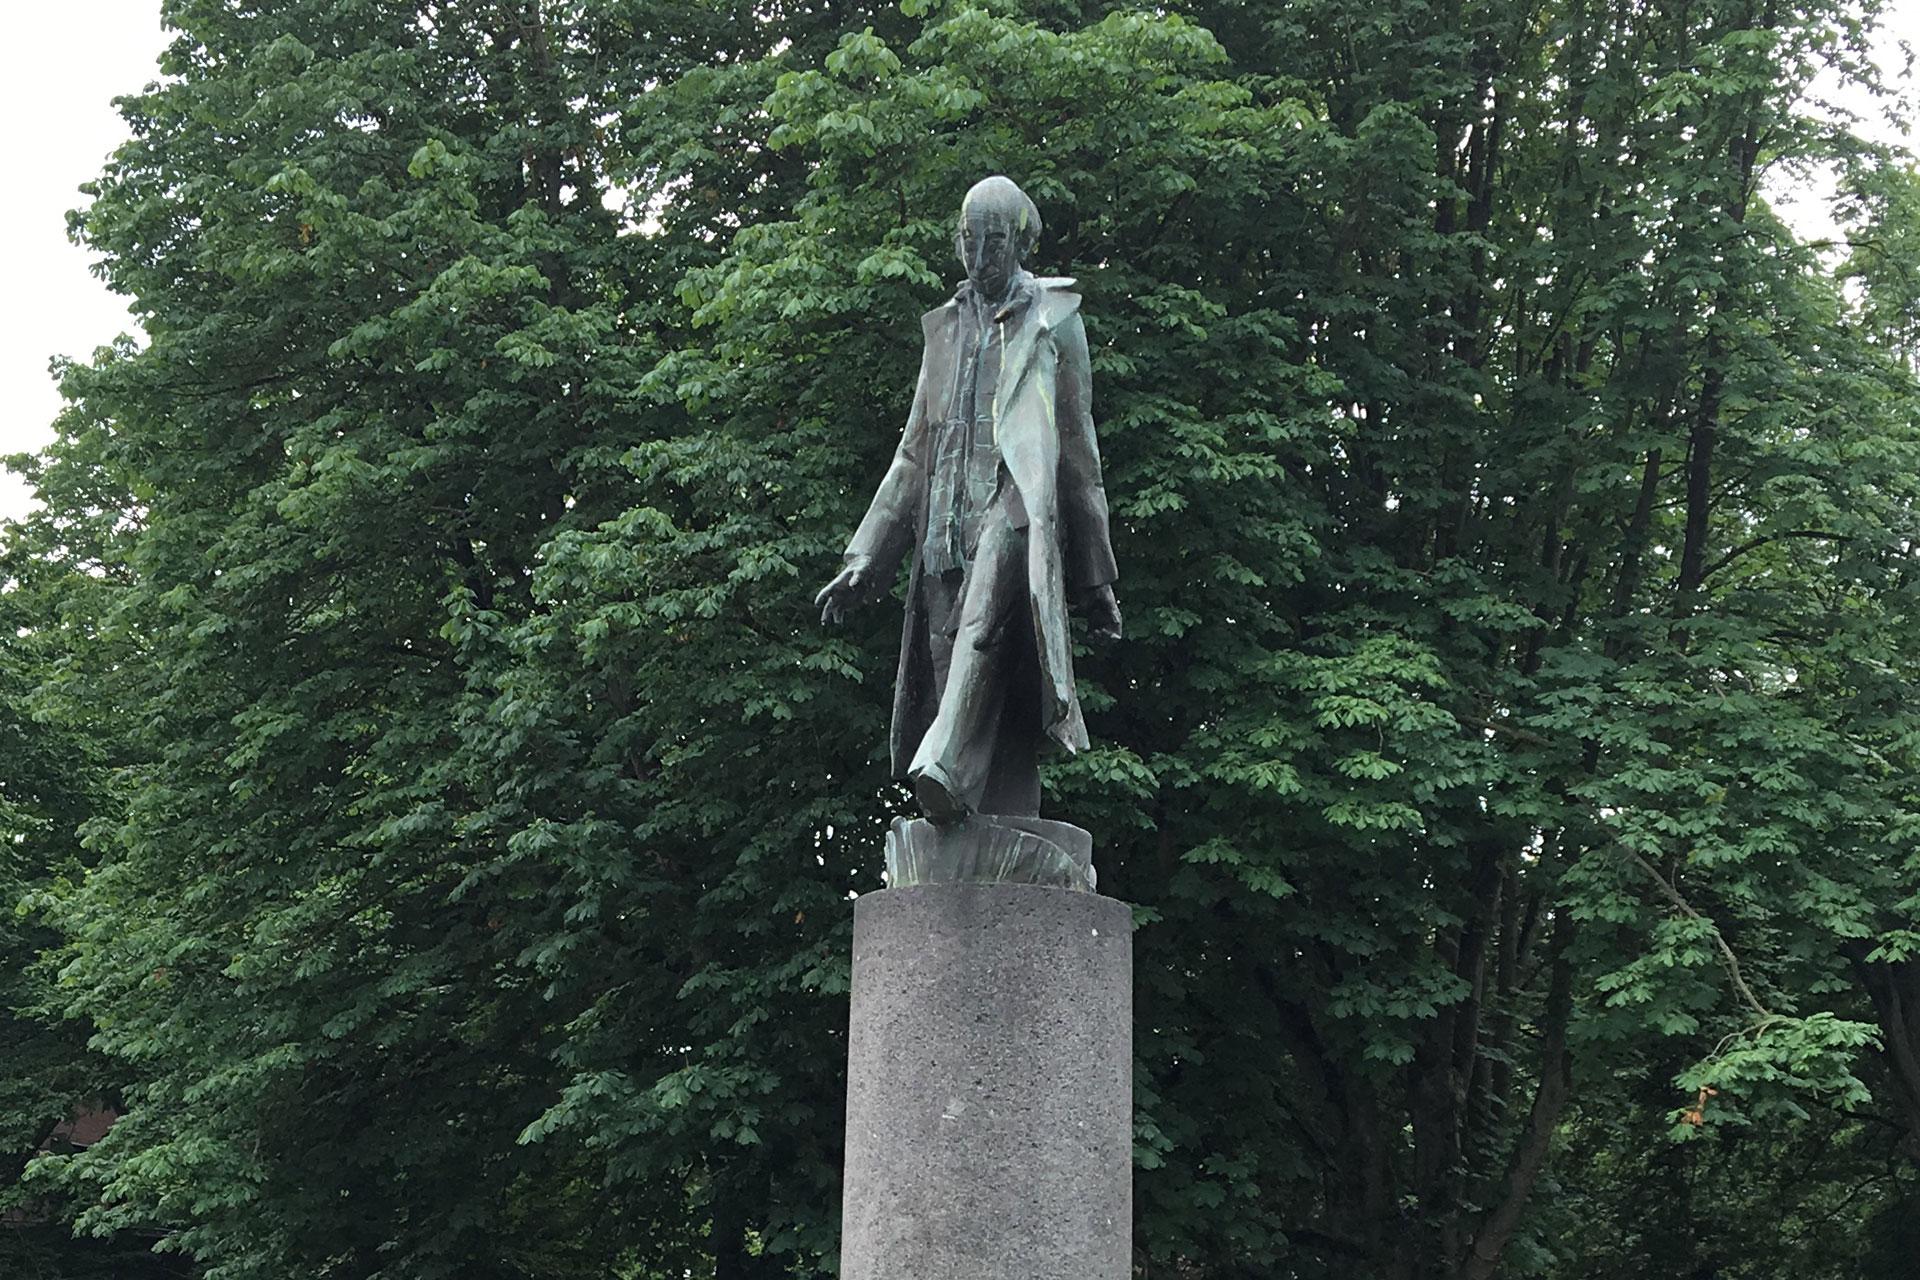 Denkmal für Hans Jonas, bedeutender jüdischer Philosoph